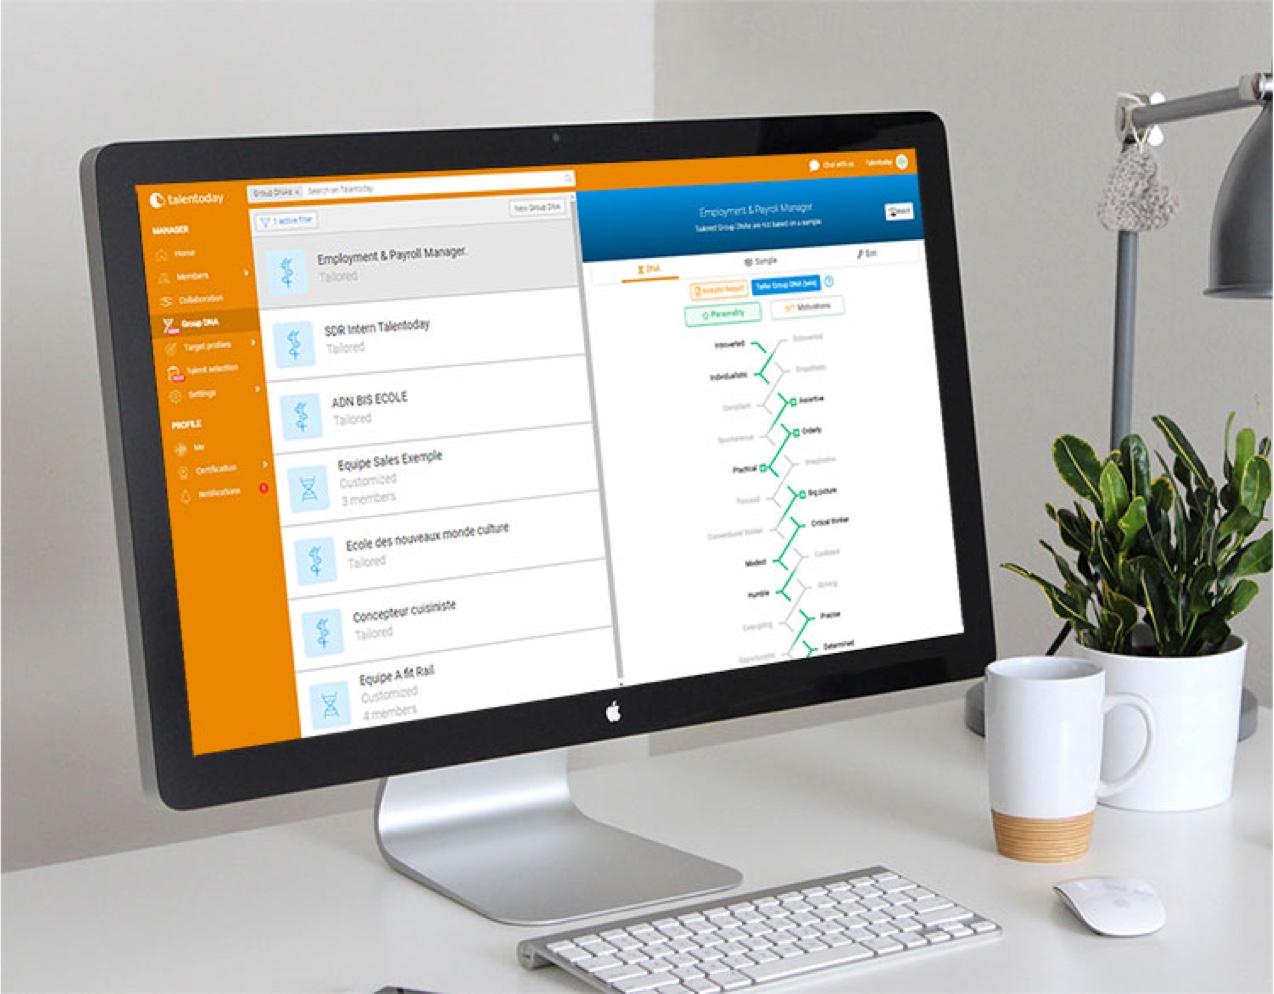 Talentoday report shown on a desktop screen